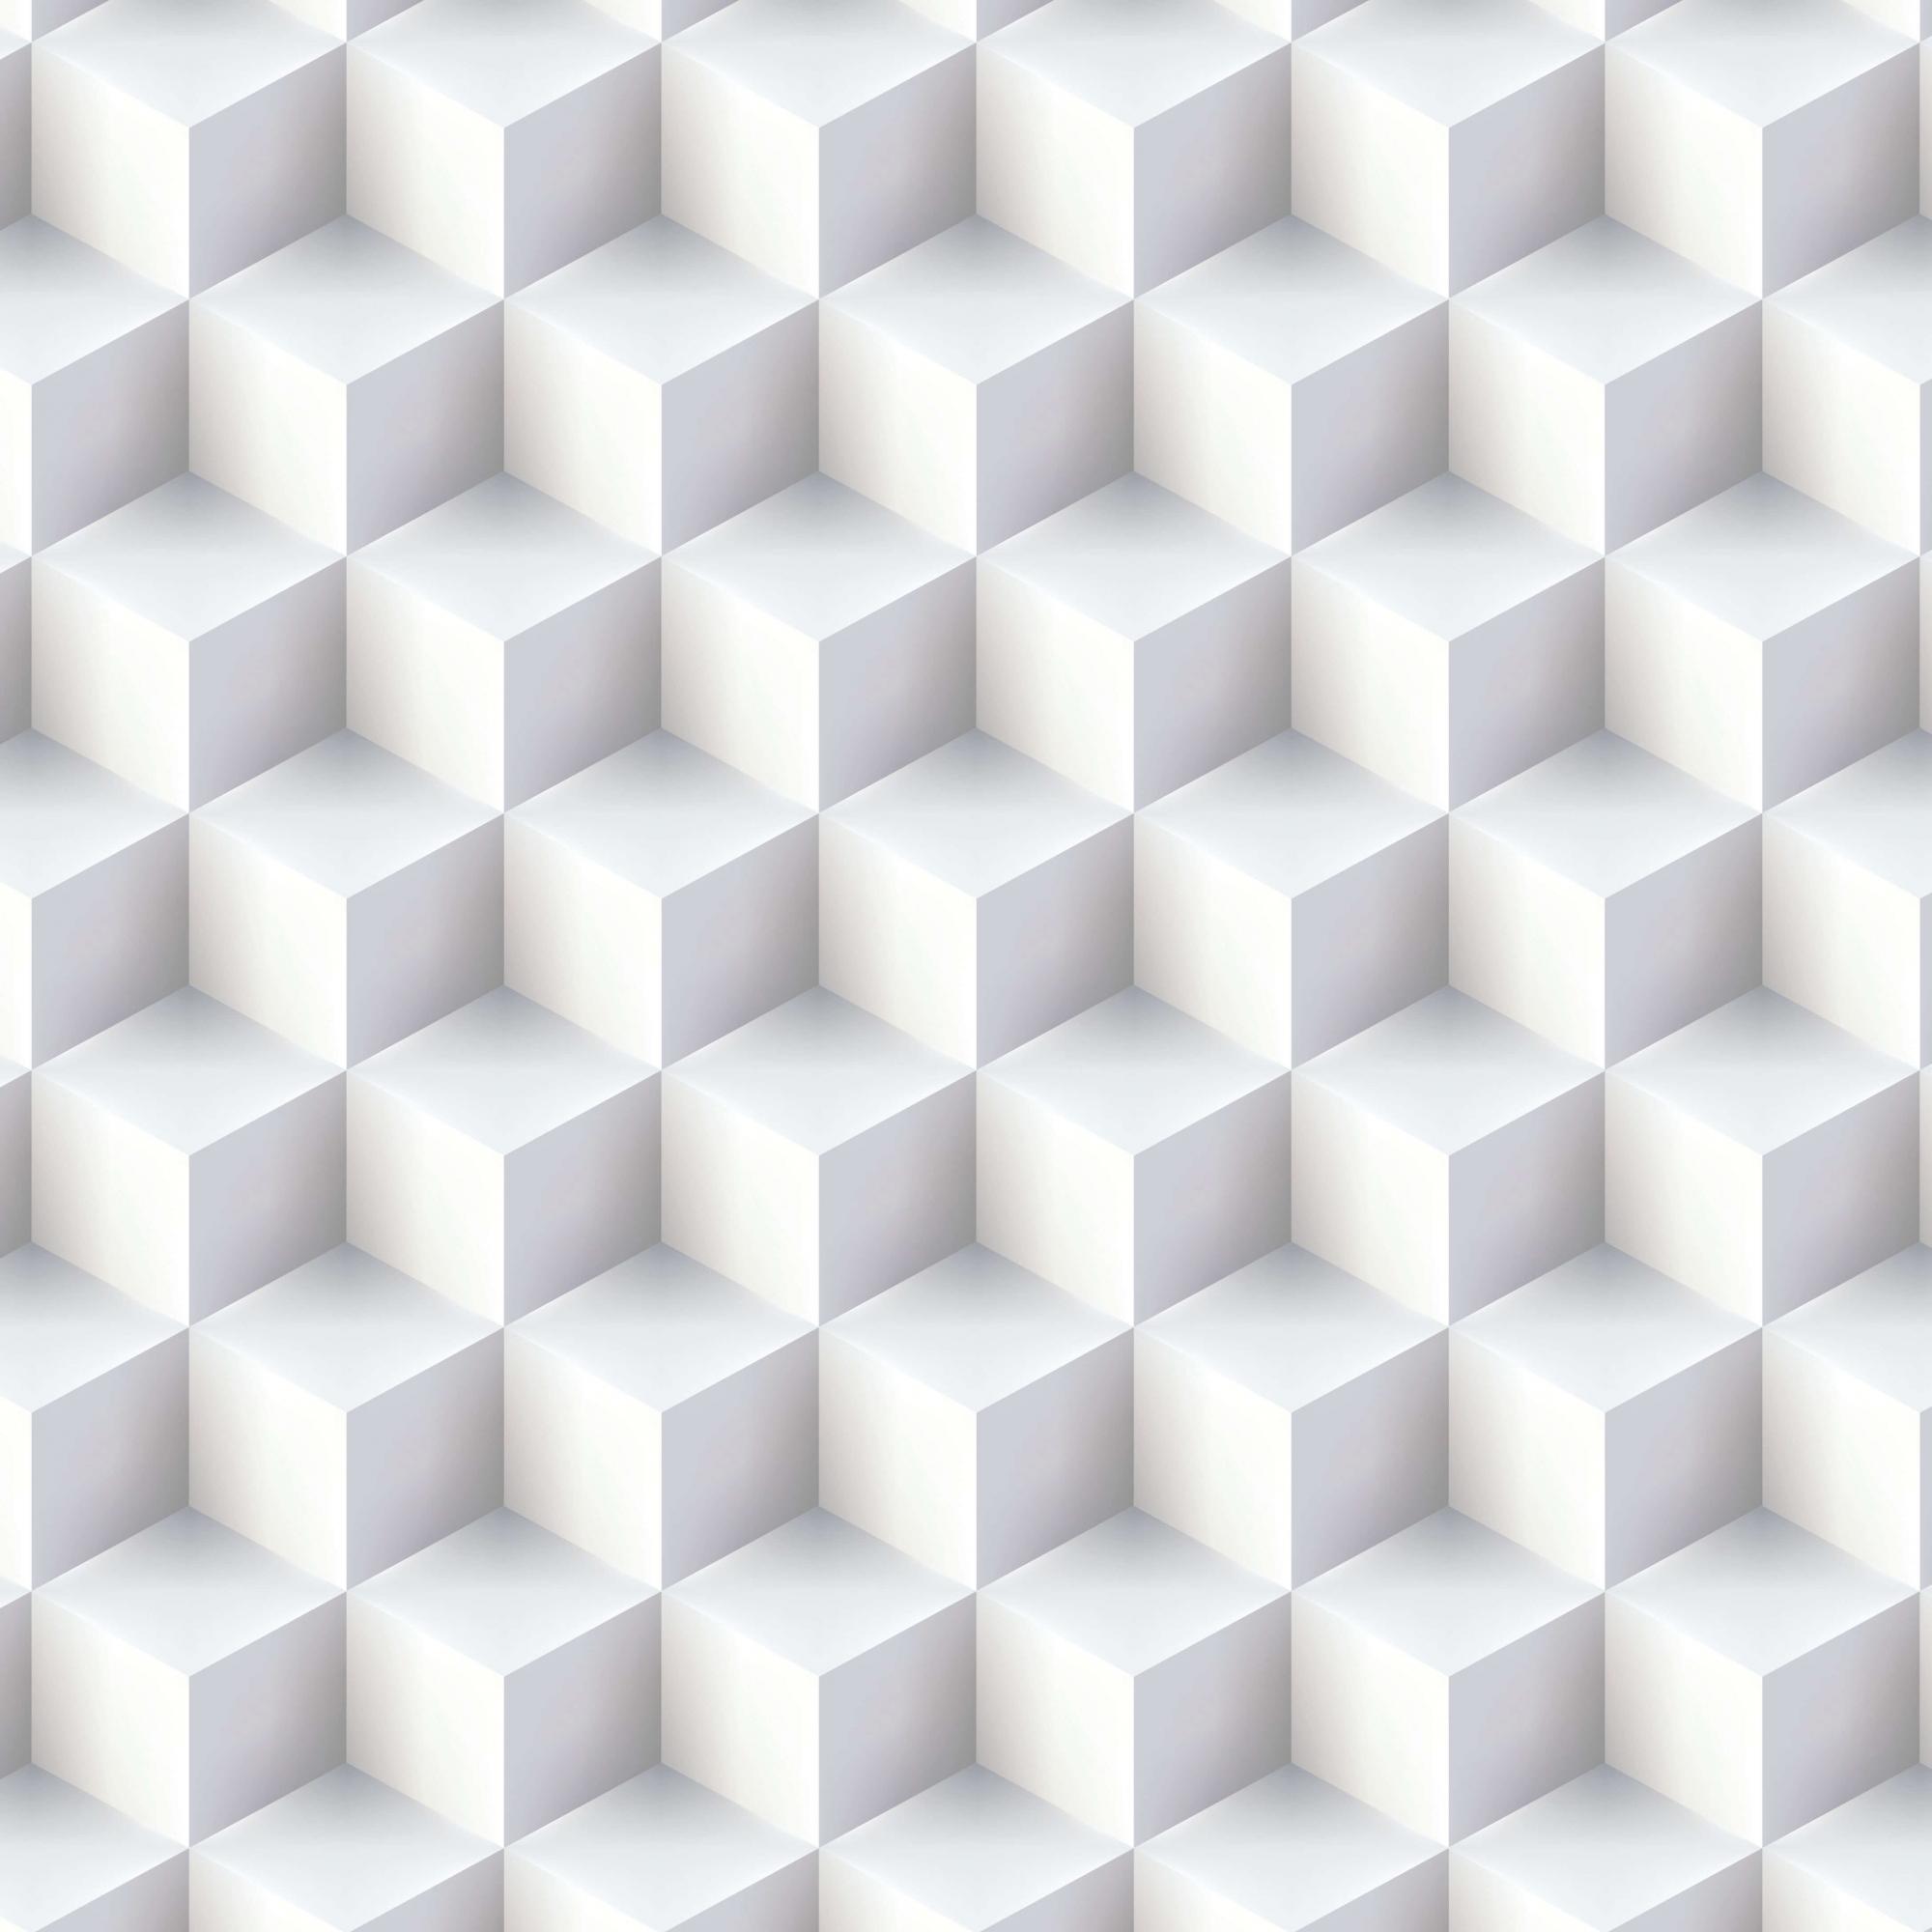 Papel de Parede Geométrico Cubo Branco Efeito 3D